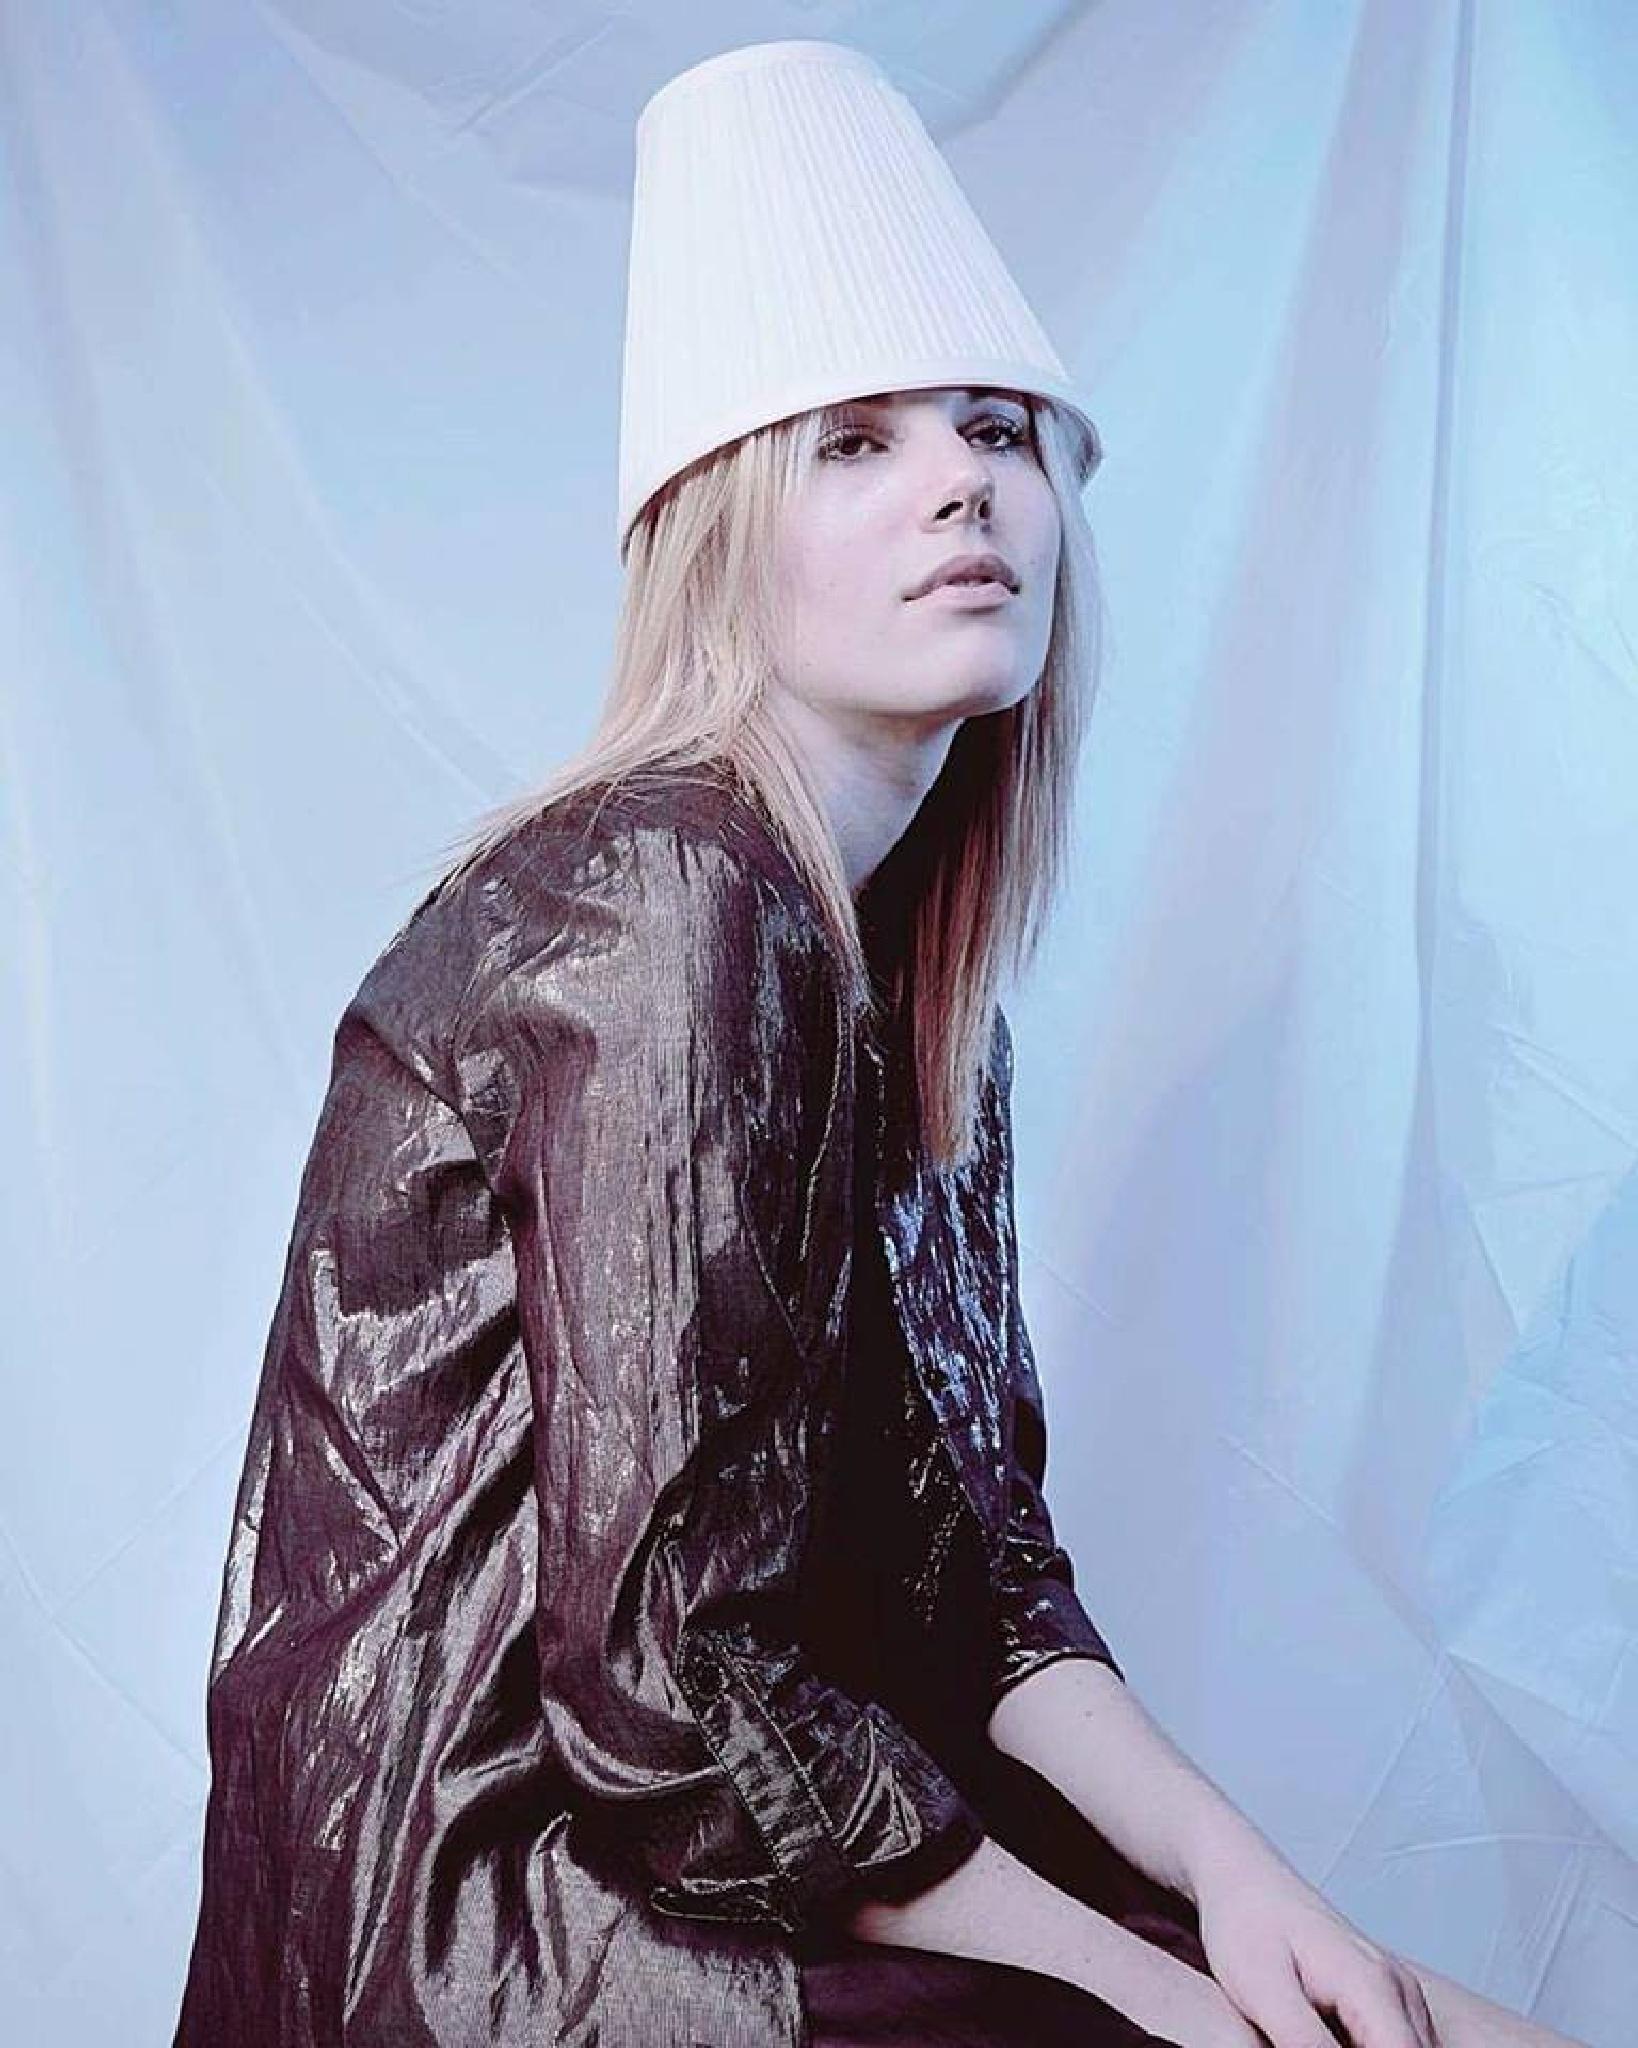 brooke by Lysandra Cassy